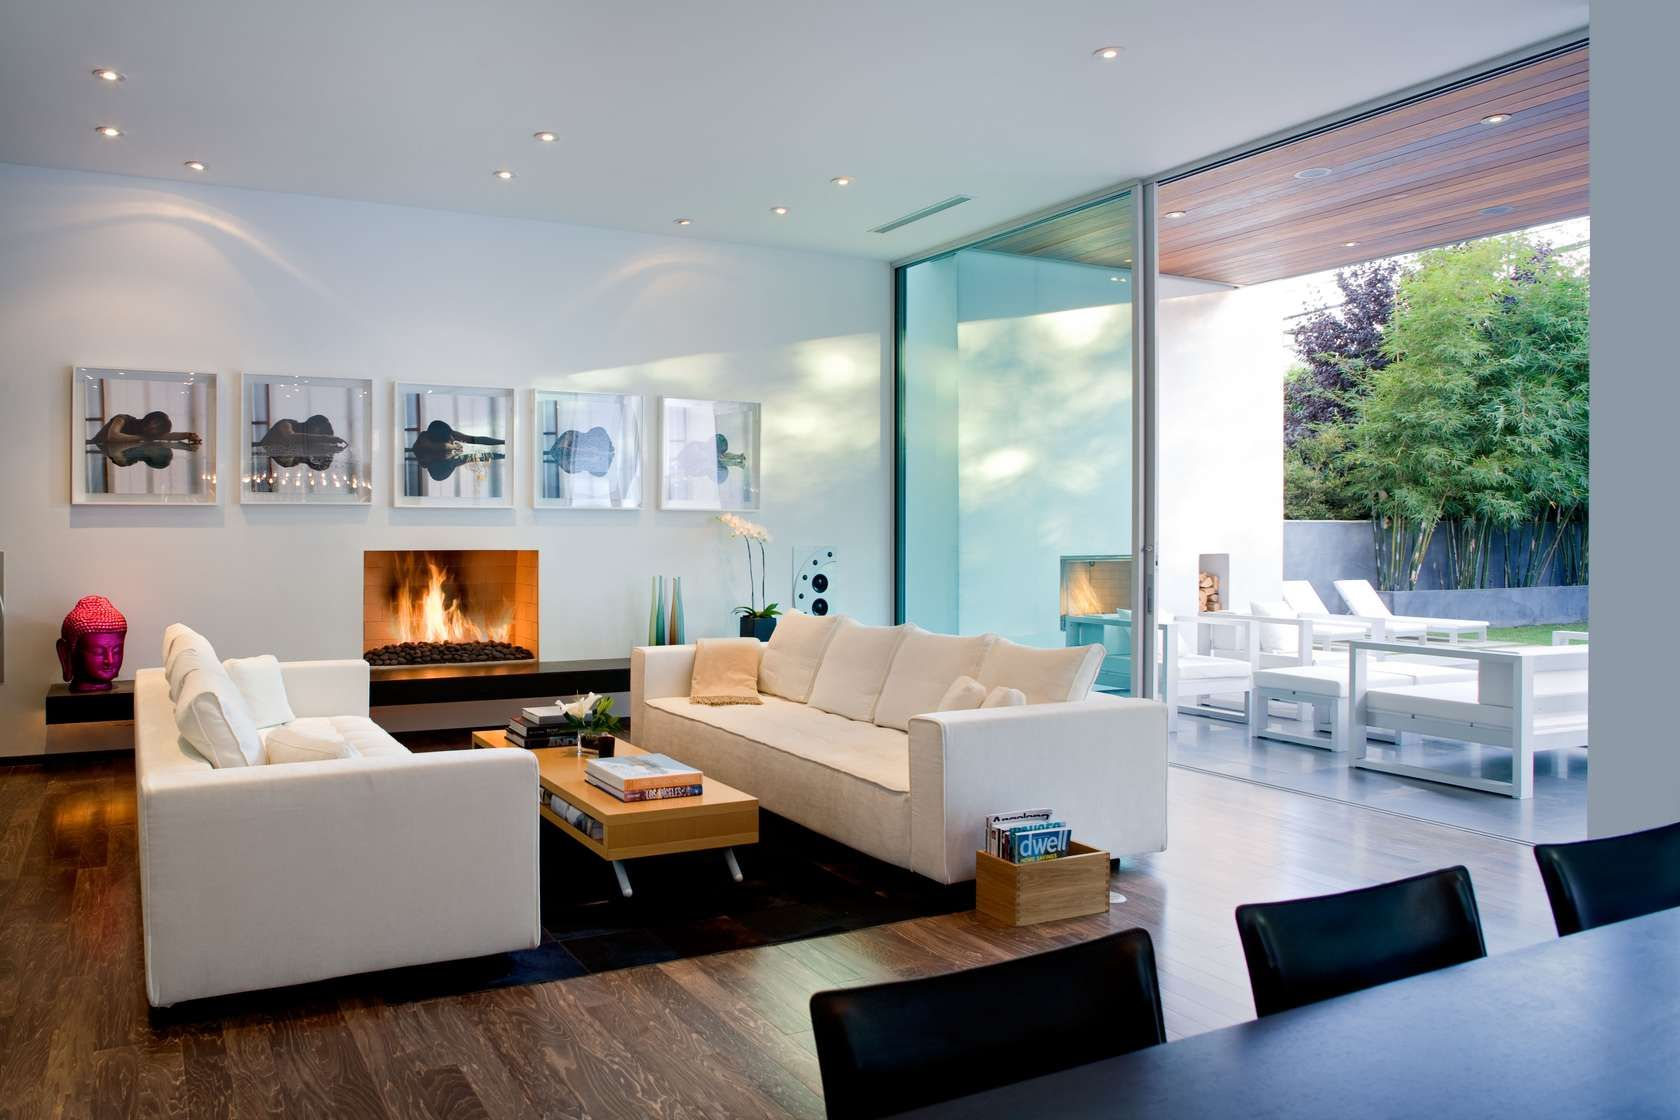 Simple house interior design ideas th street residence  next reno ideas  pinterest  display wall